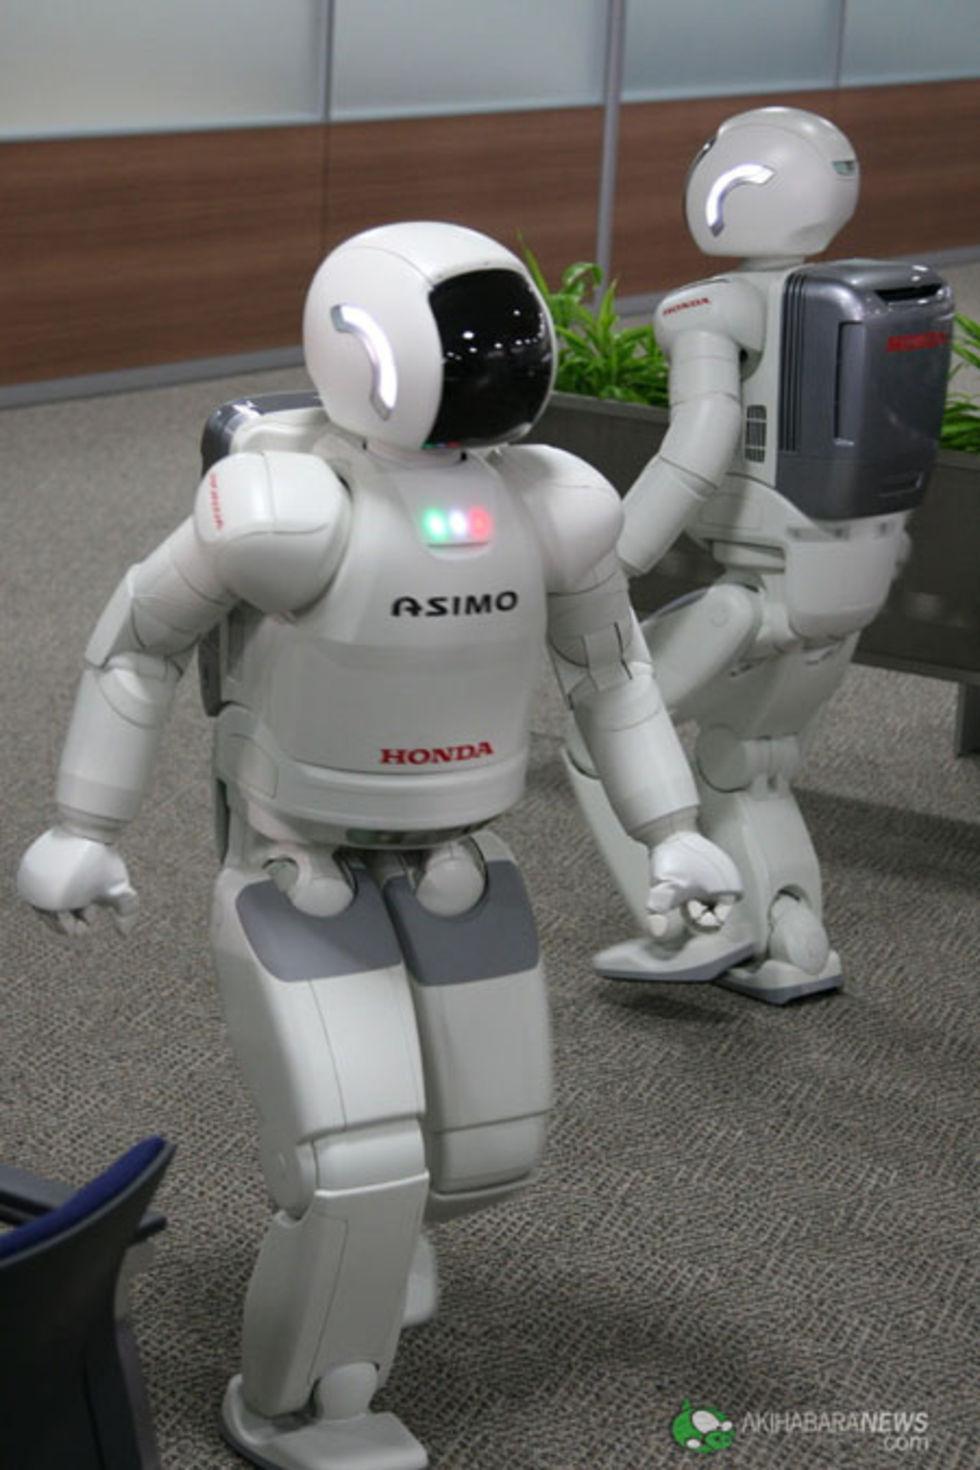 Roboten Asimo uppdaterad!